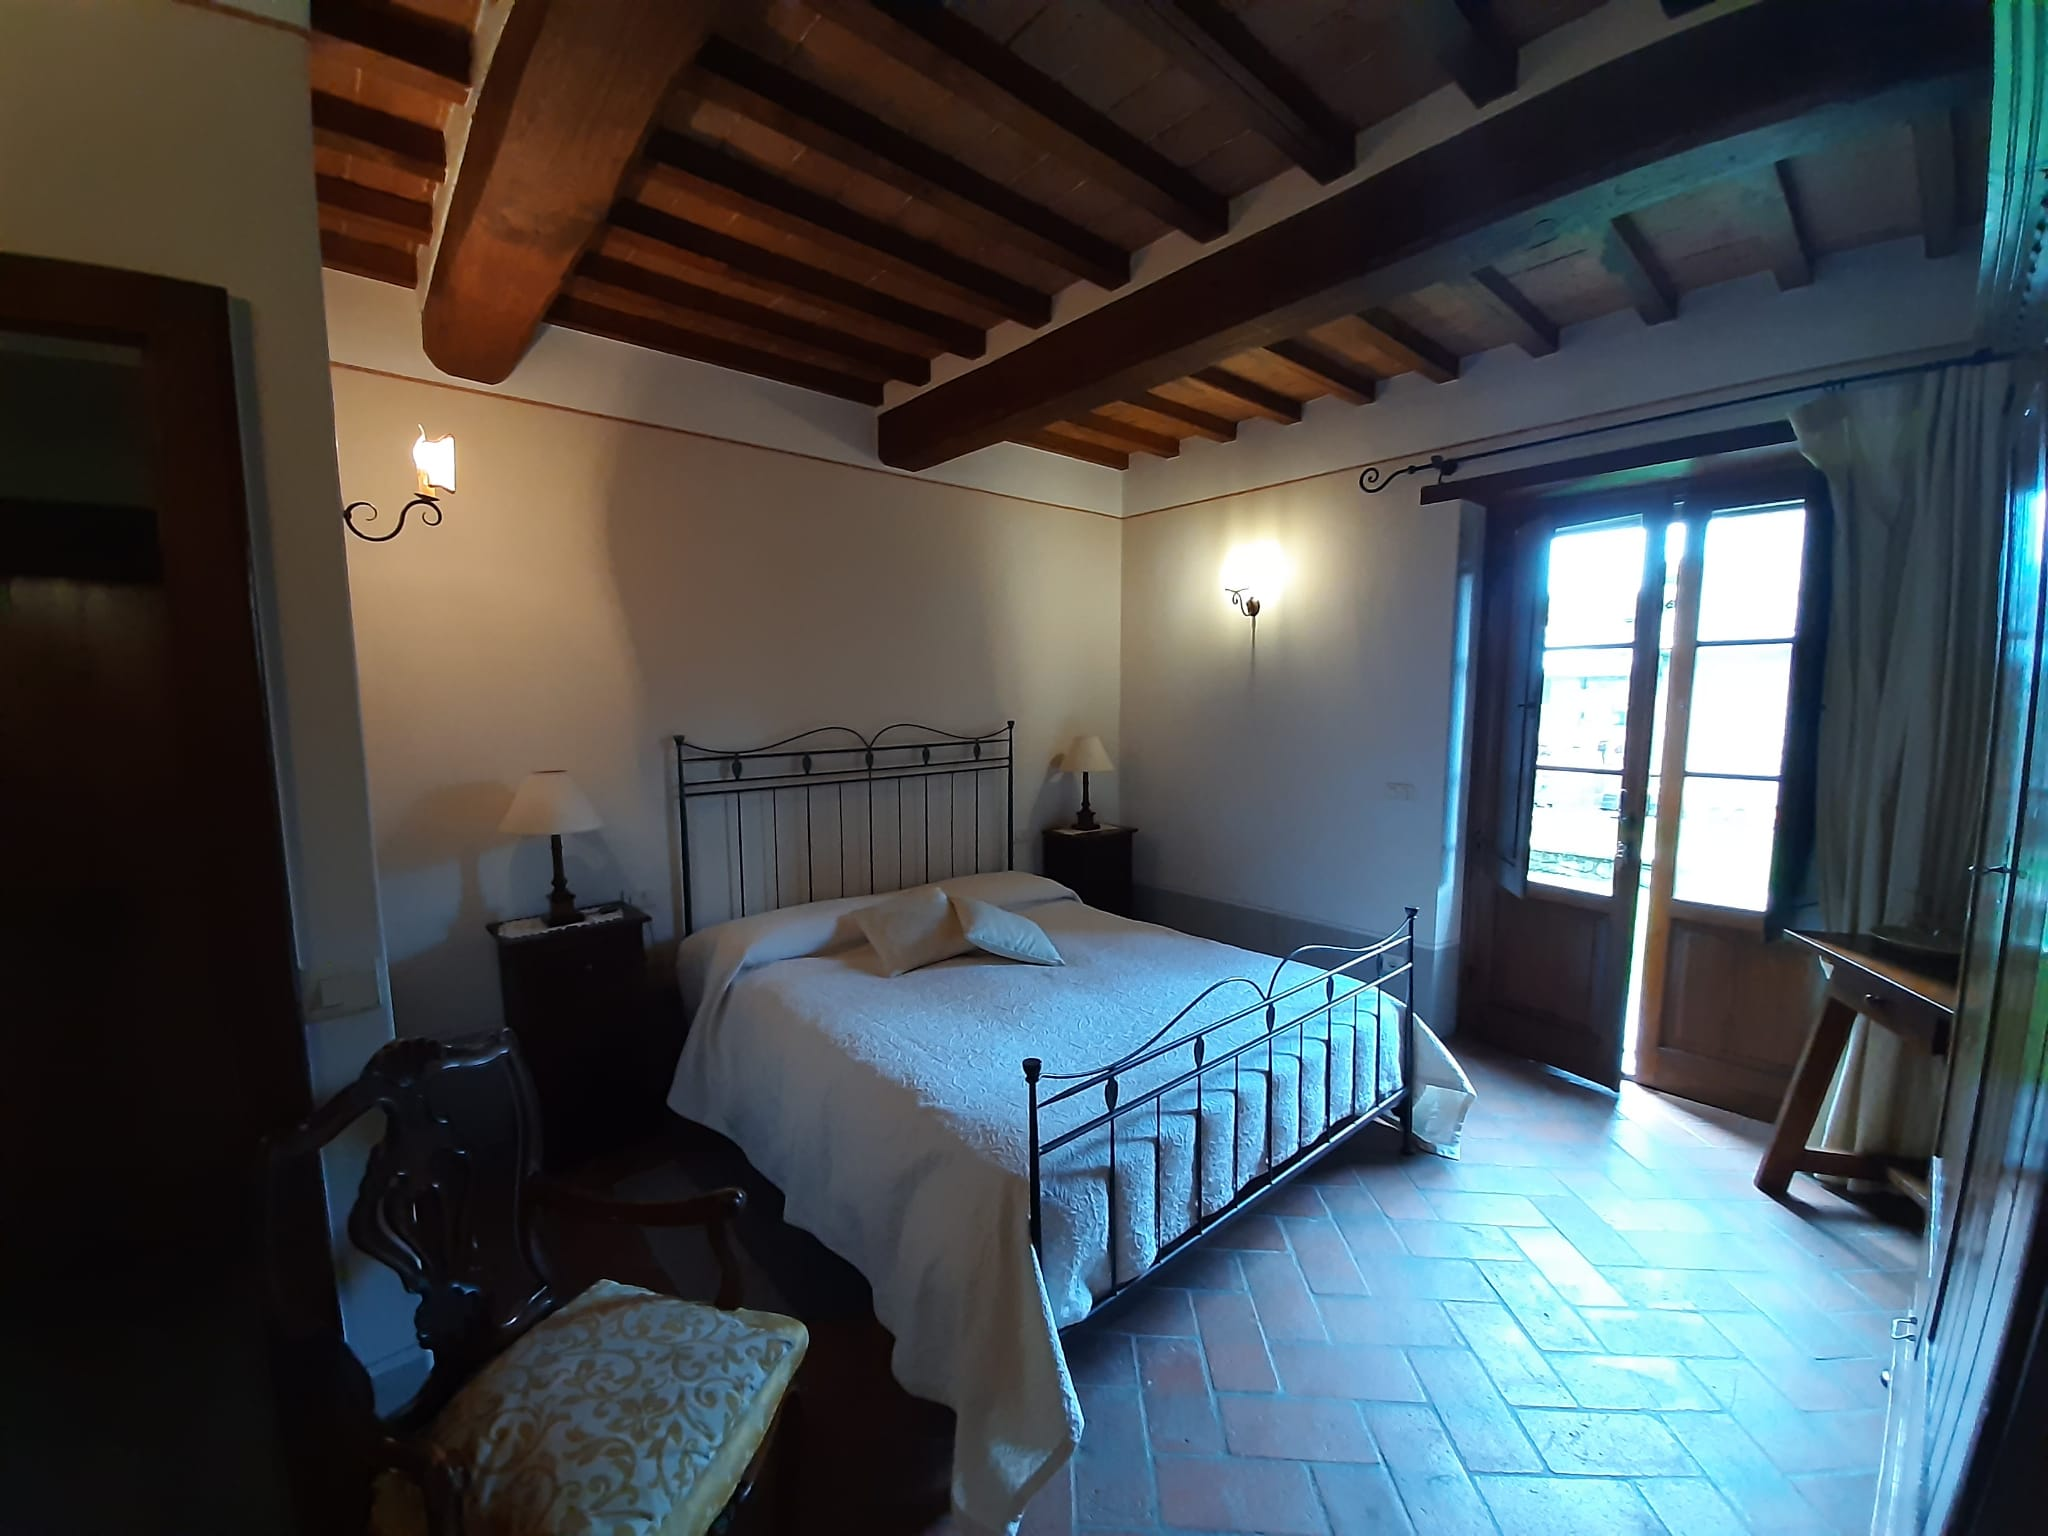 HOTEL A CORTONA, I PAGLIAI